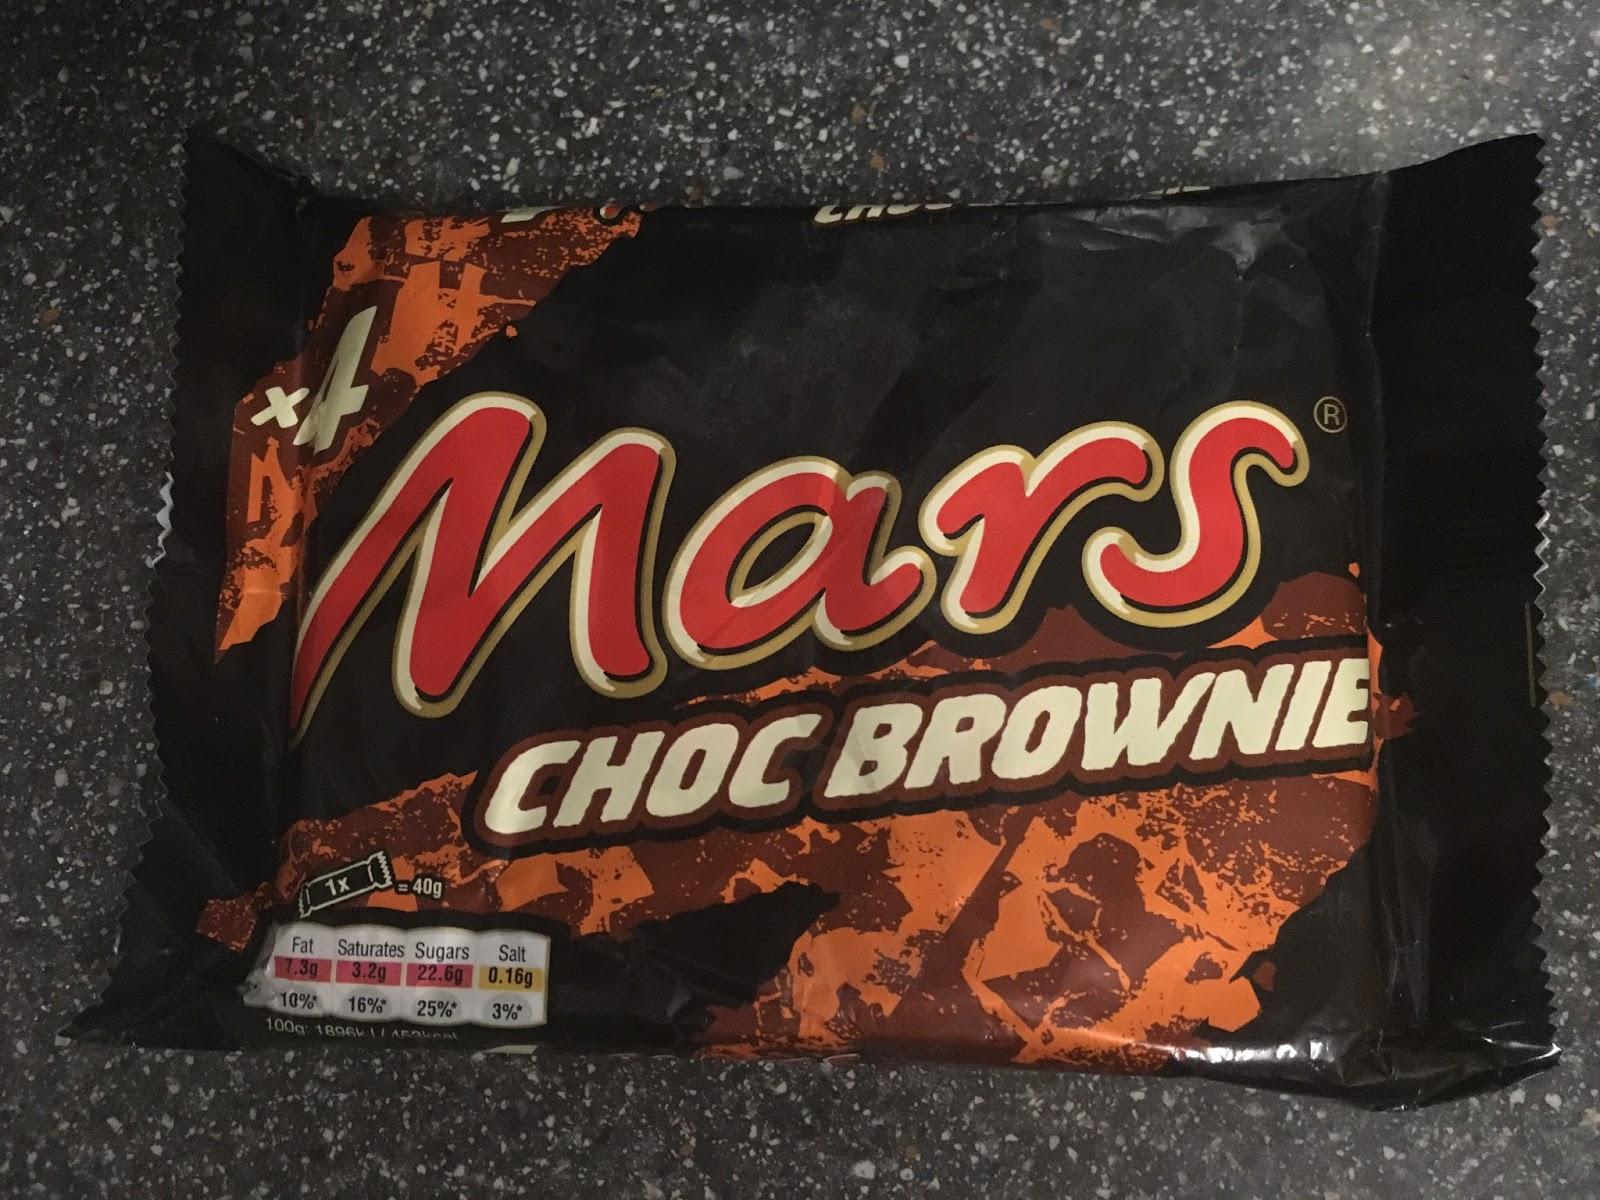 Mars Bars Choc Brownie Flavour ( 4 Pack) £1 @ Poundland